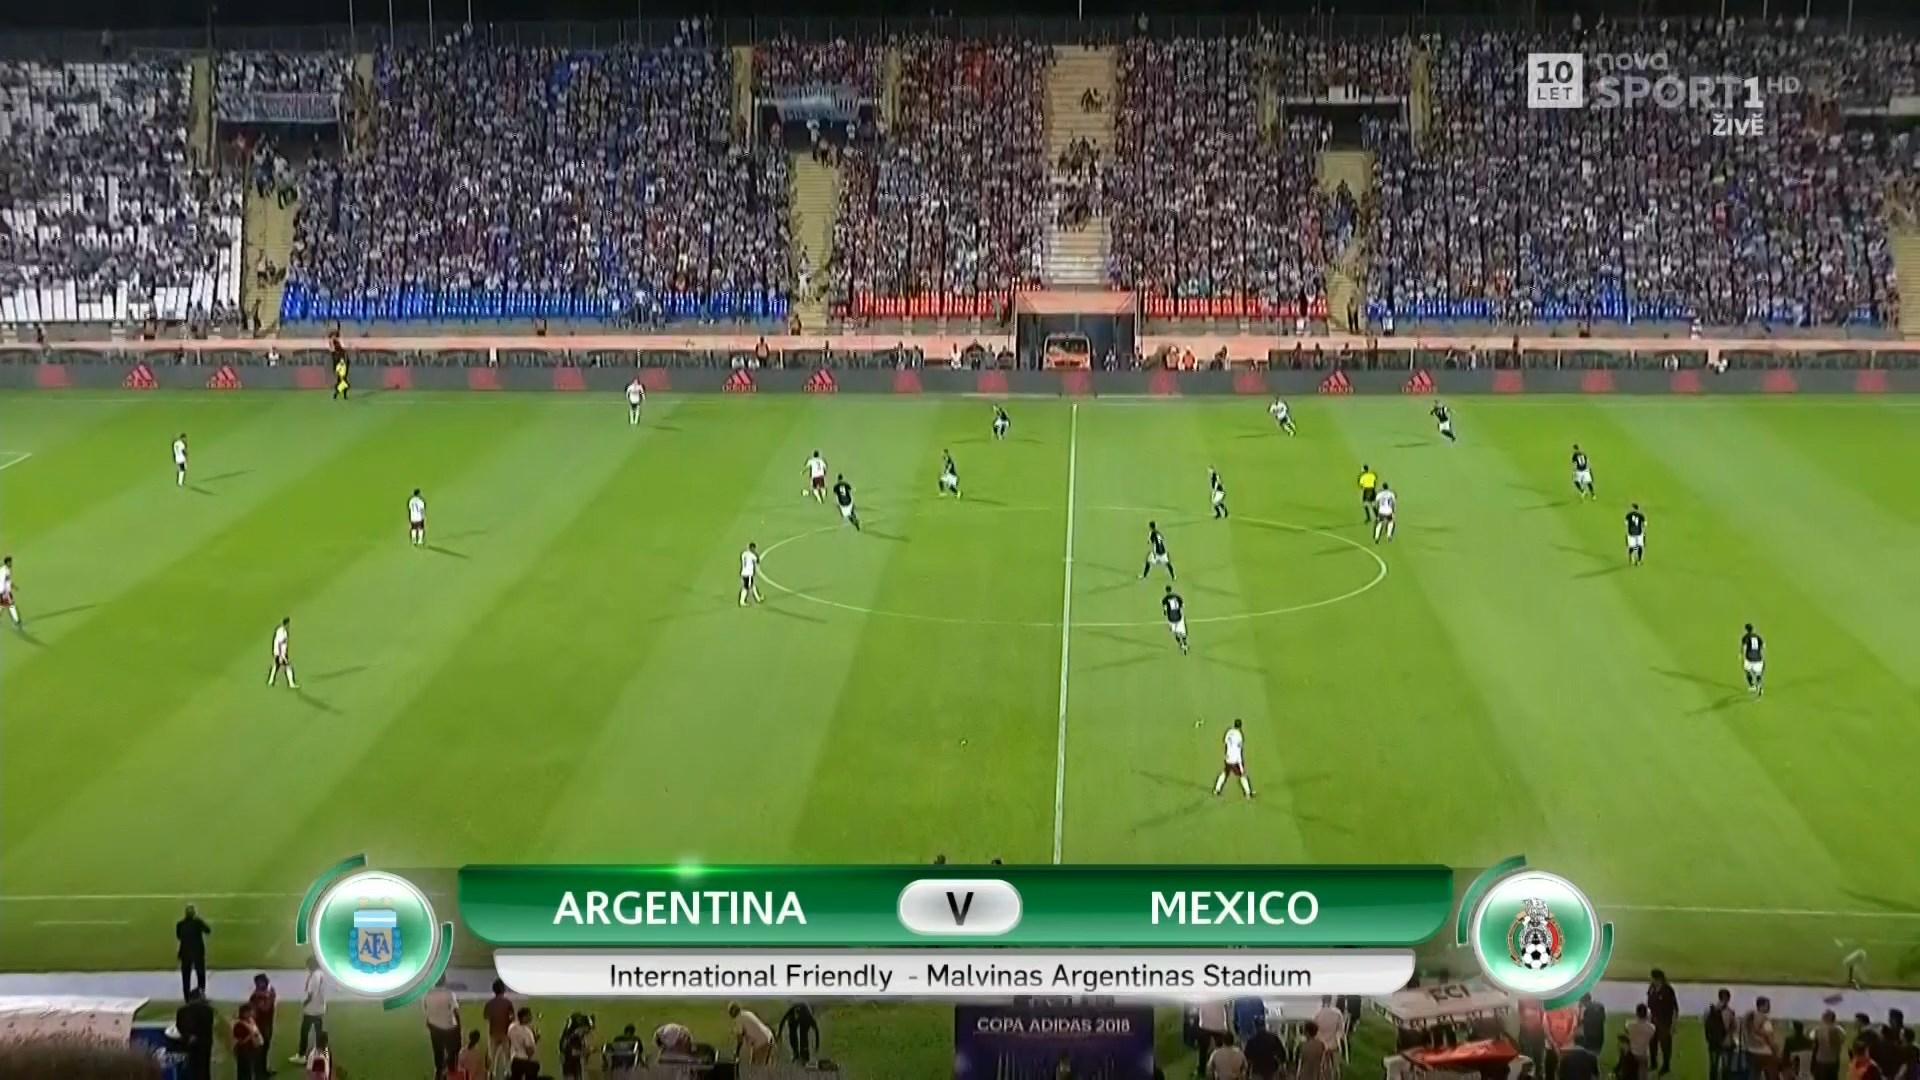 FUTBOL: International Friendly - Argentina vs  Mexico - 20